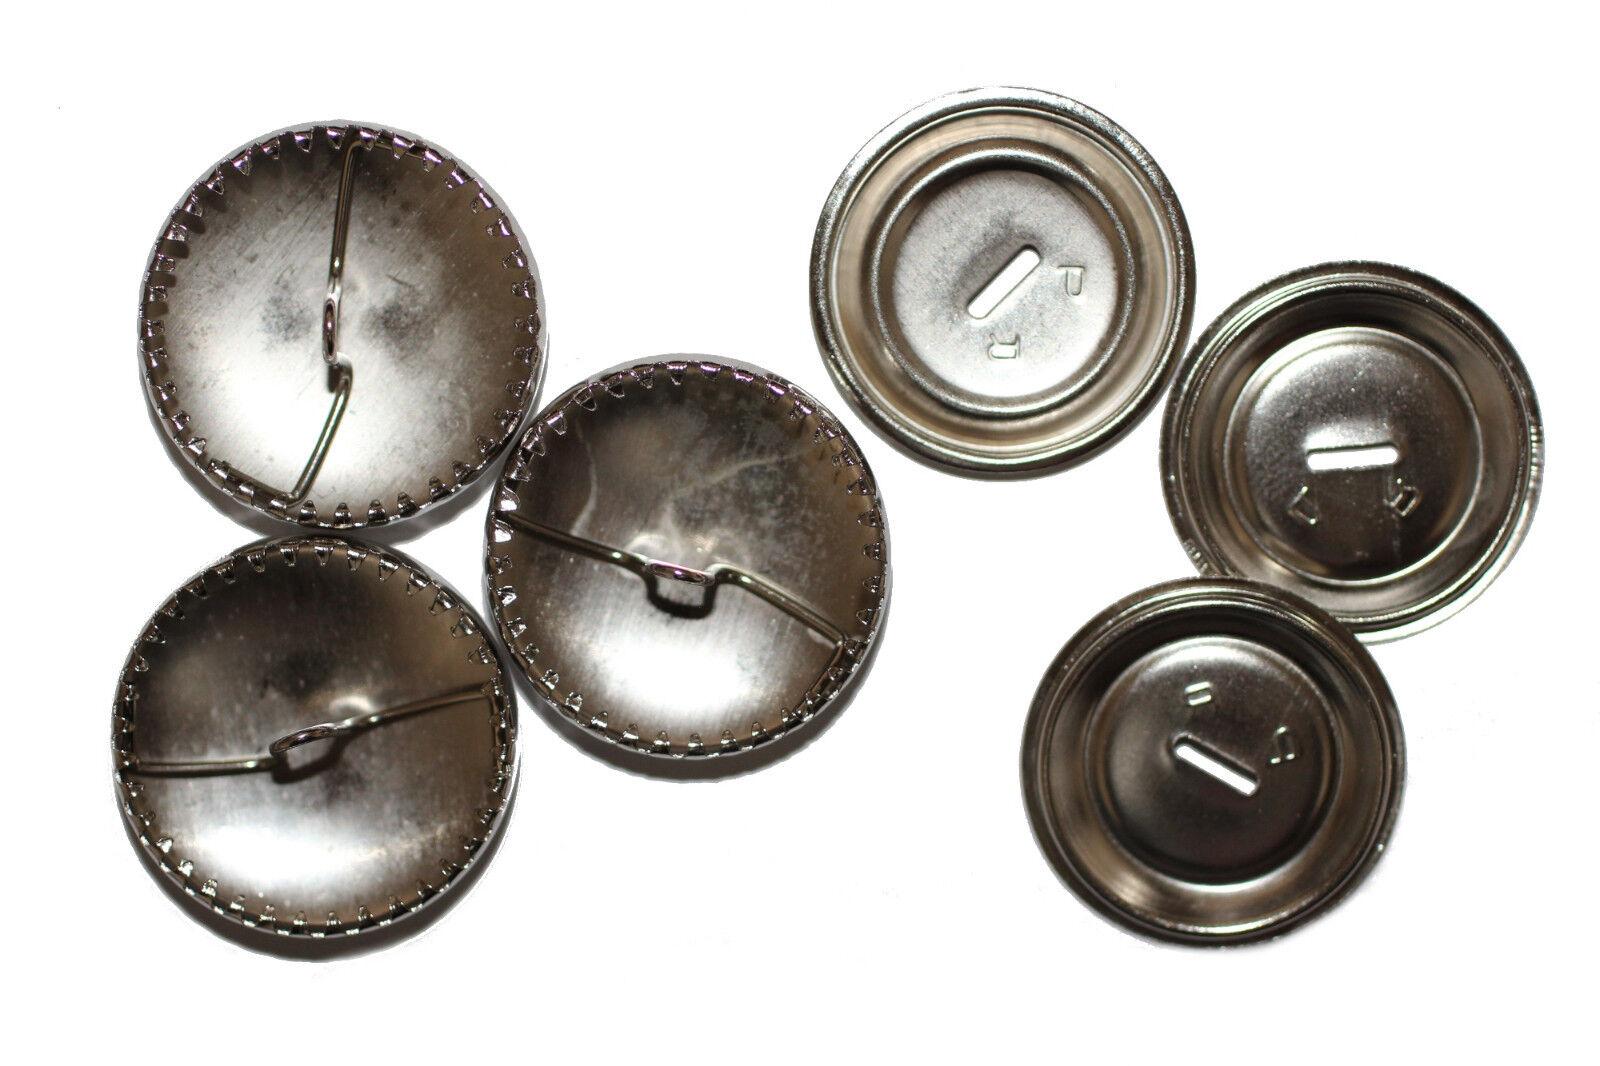 Überziehbare Knöpfe, 29mm - 10 Stück, Knopfrohlinge aus Metall